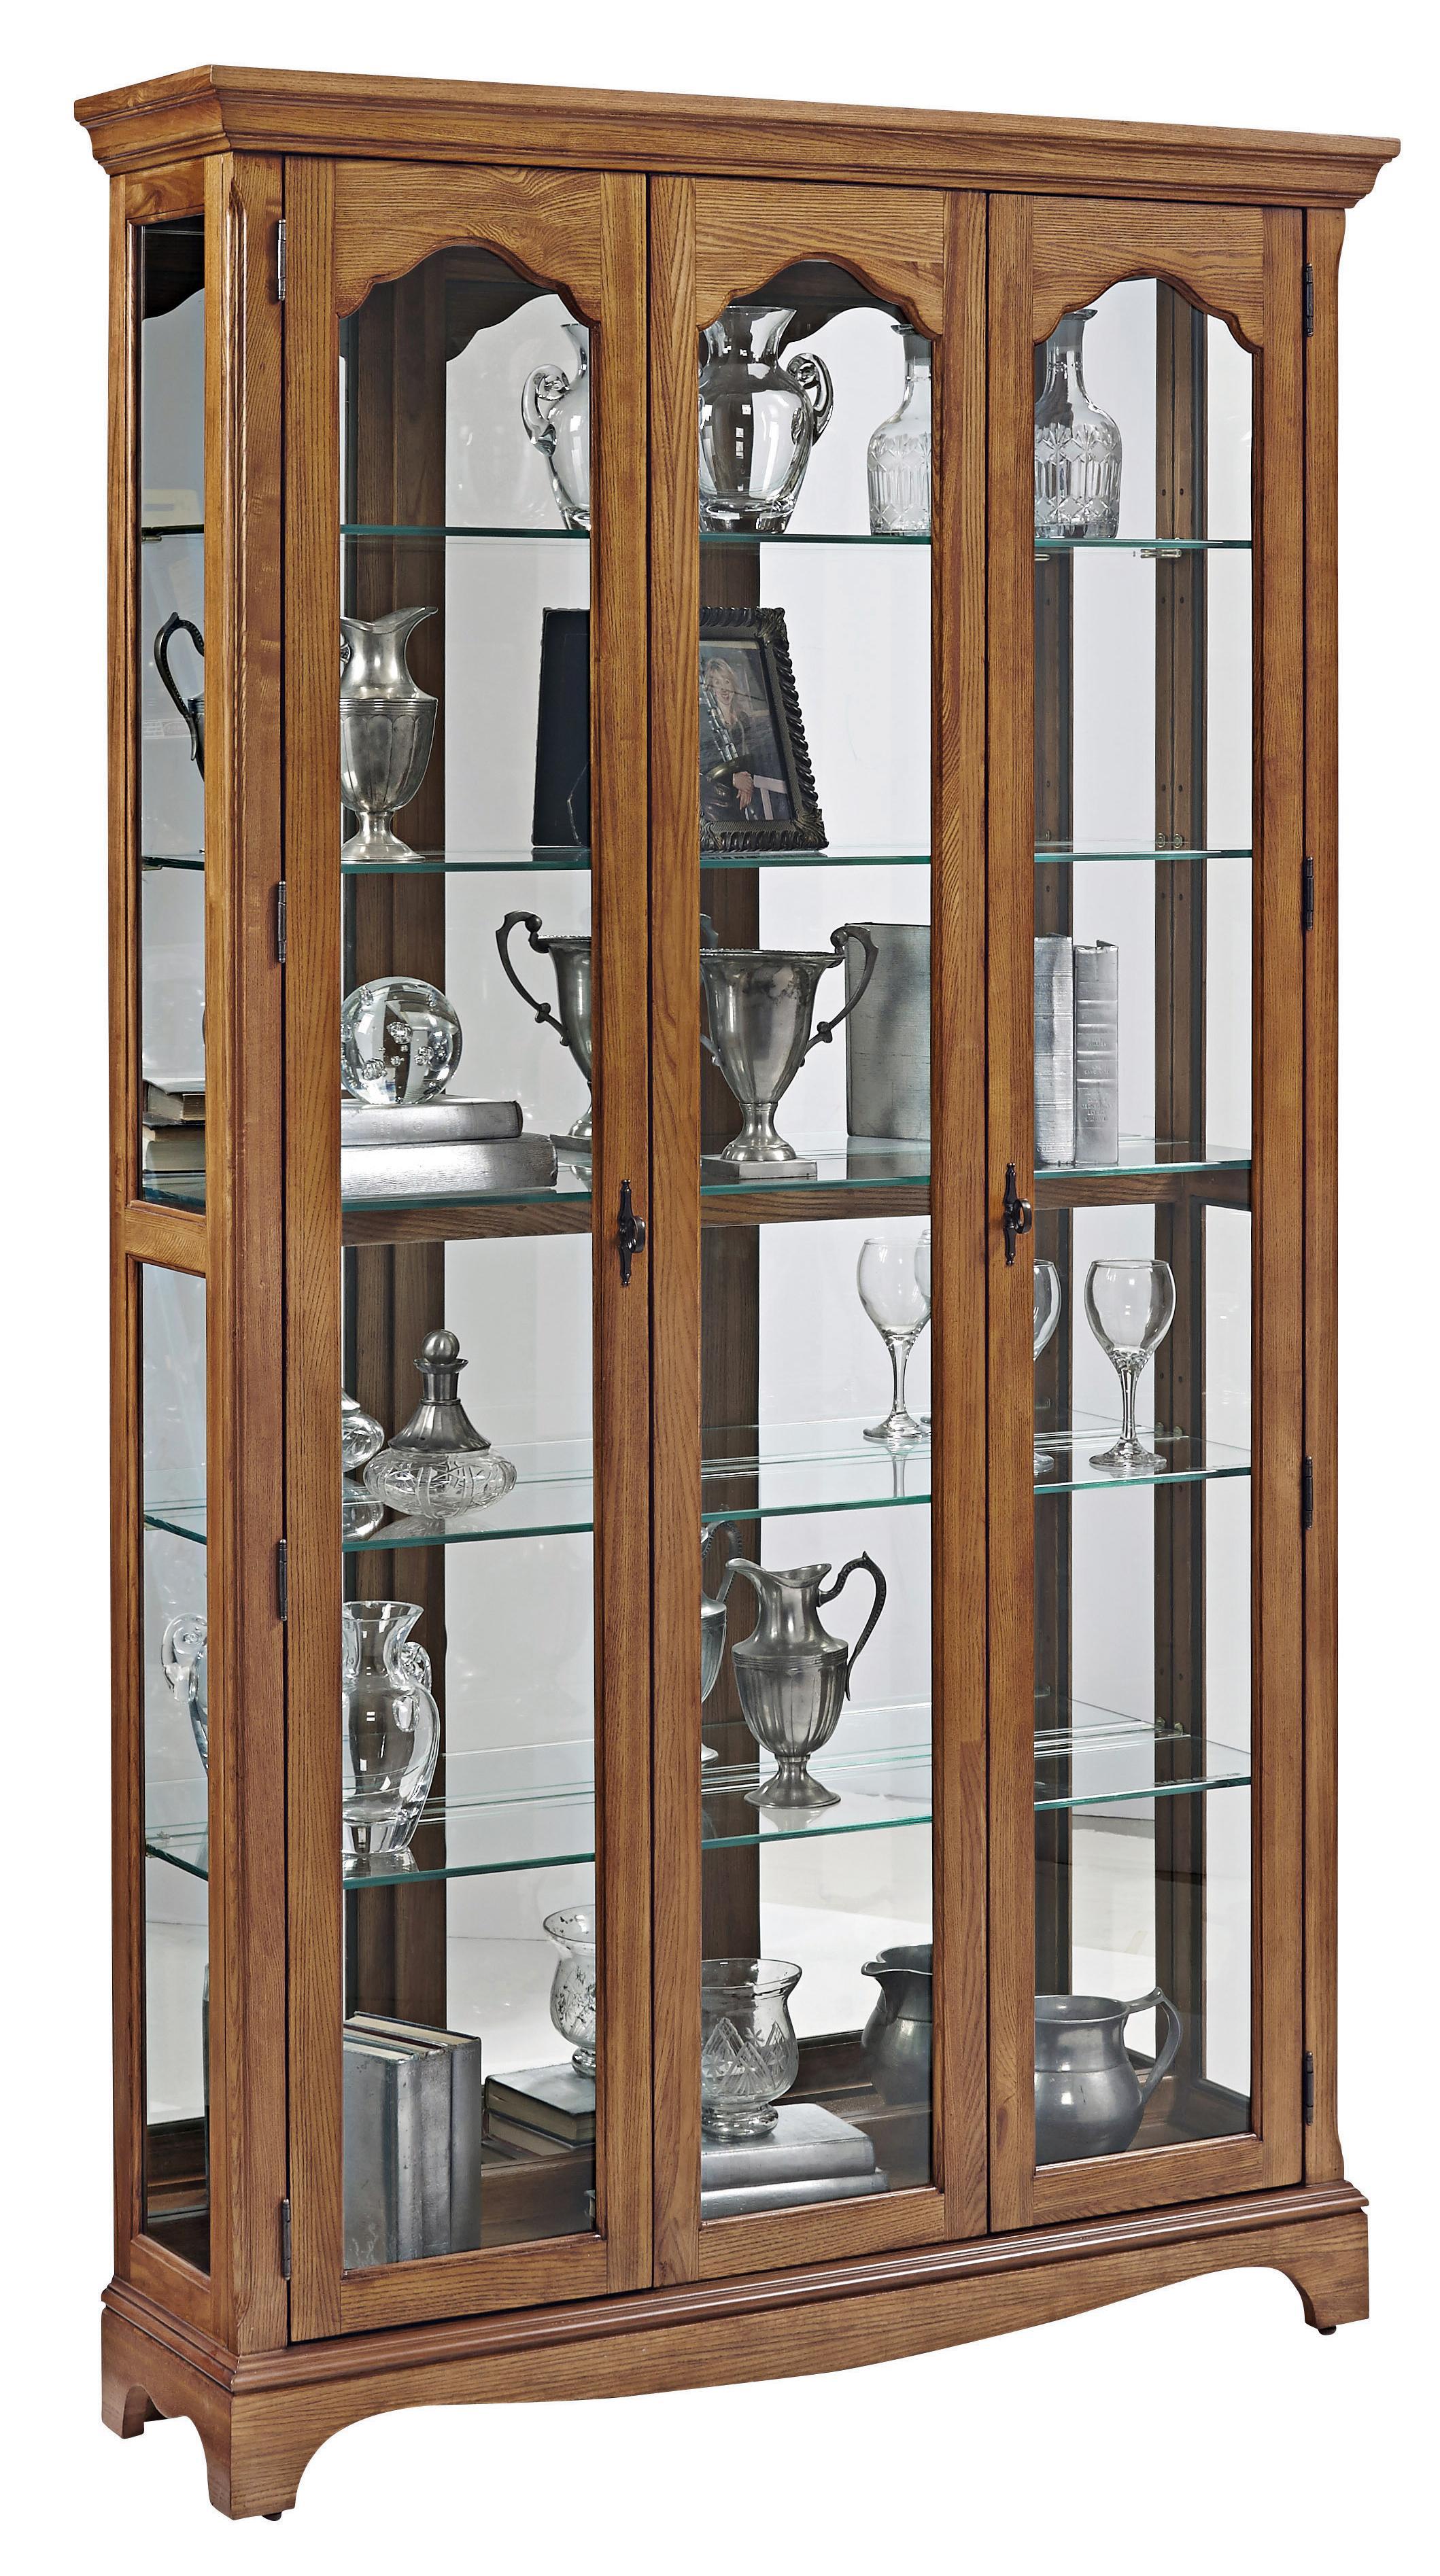 Pulaski Furniture Curios Tradtional Wide Curio W Glass Shelves Miskelly Furniture Curio Cabinet